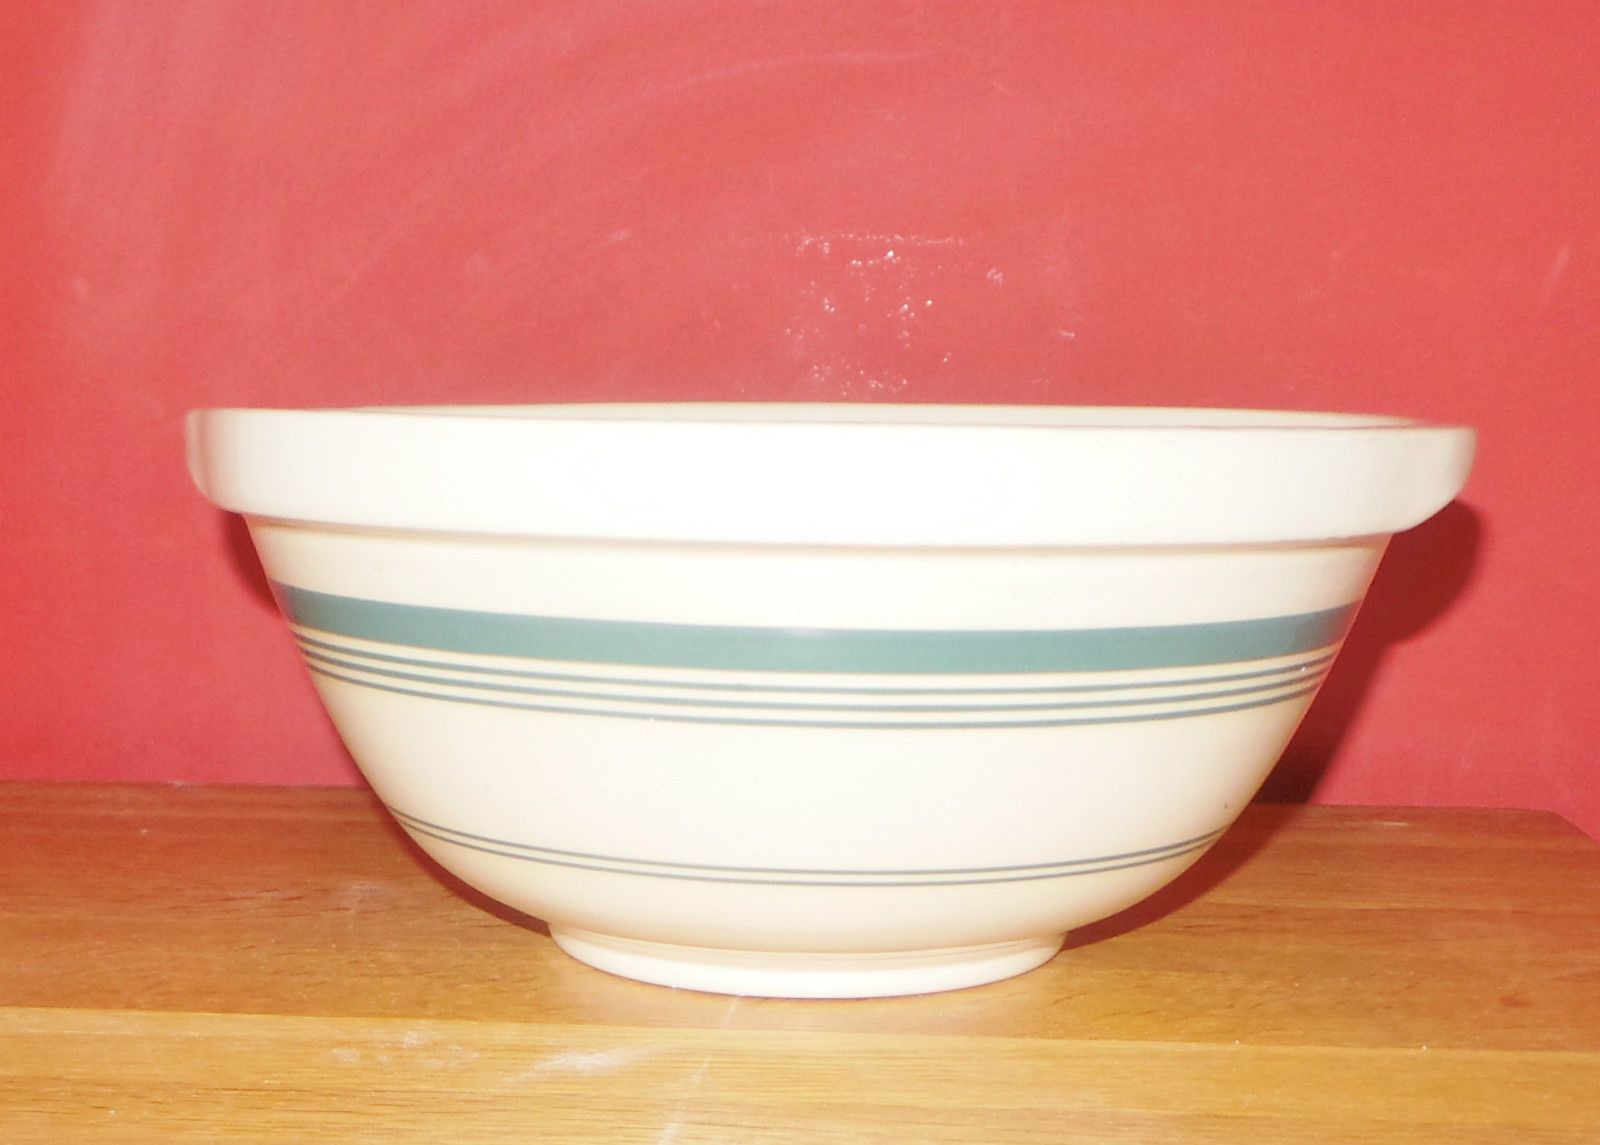 T.G.Green \'Gresley Green\' Mixing Bowl | Gresley Green | Pinterest ...